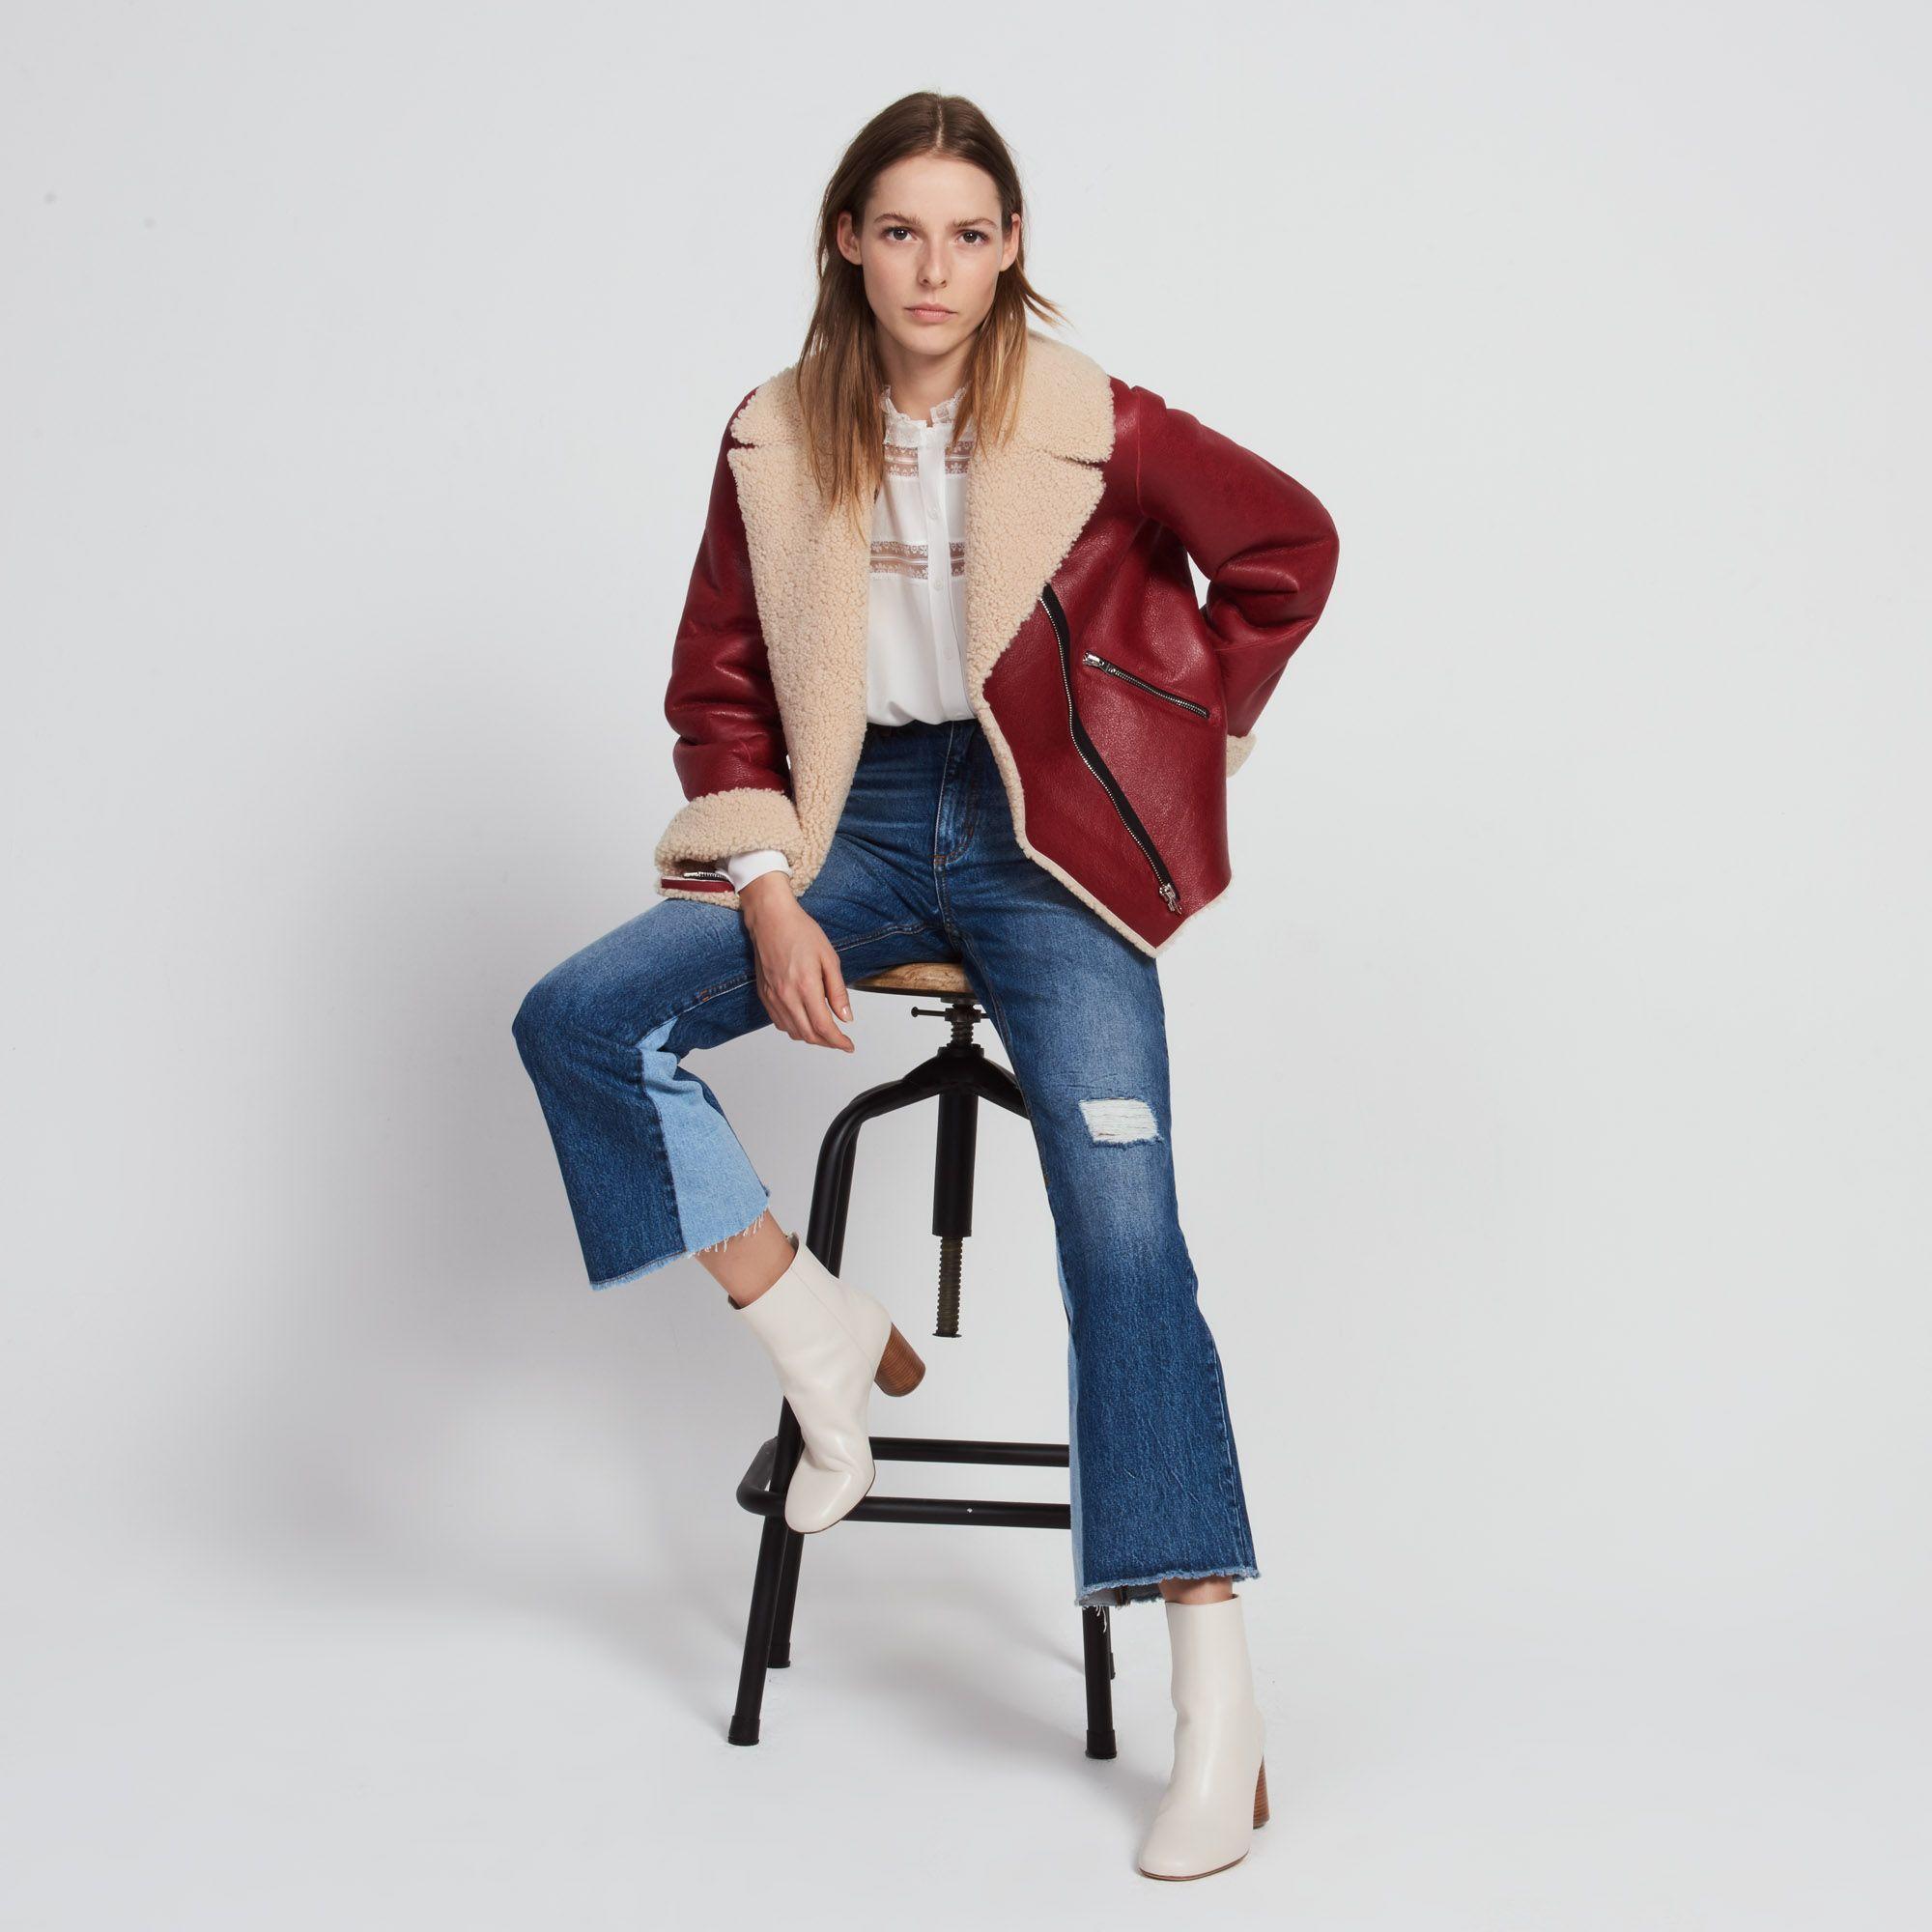 2a982dd33 Sheepskin jacket - Coats - Sandro-paris.com | chloe look | Designer ...